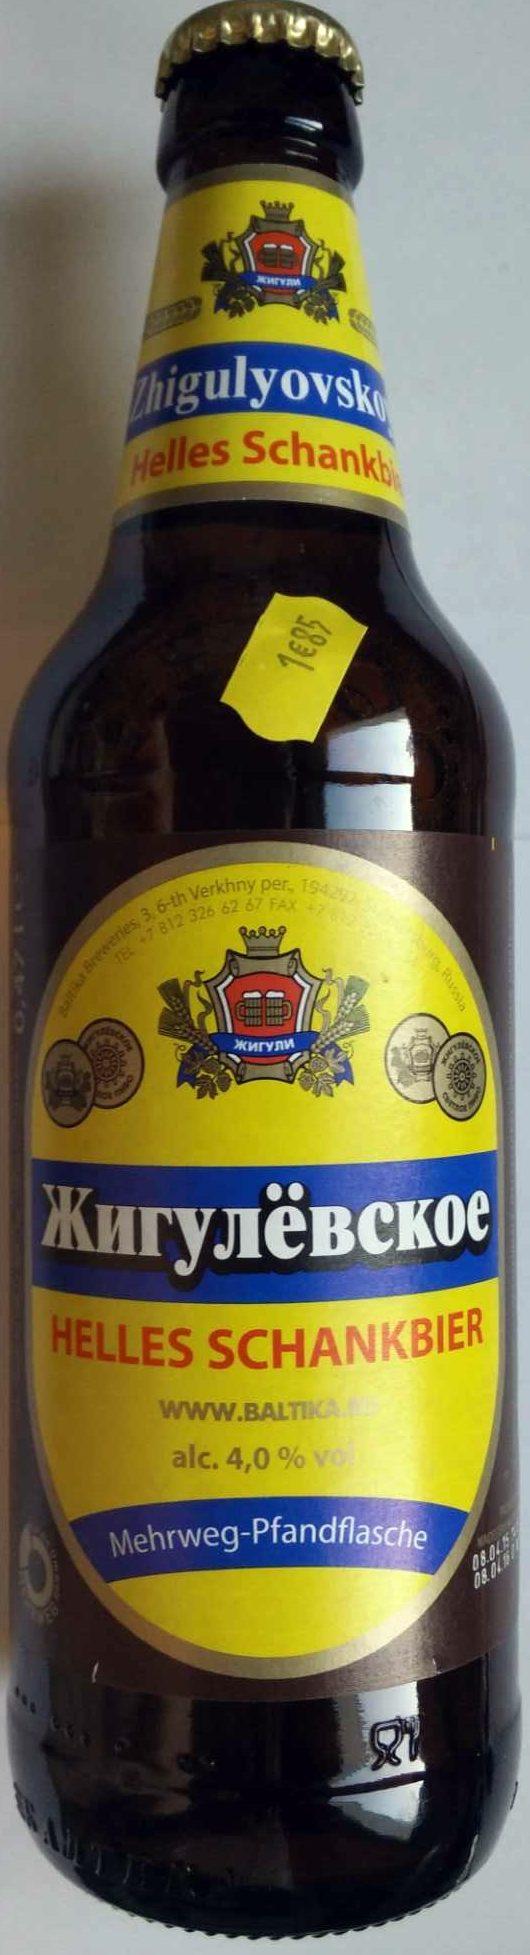 Zhigulevskoye Helles Schankbier - Продукт